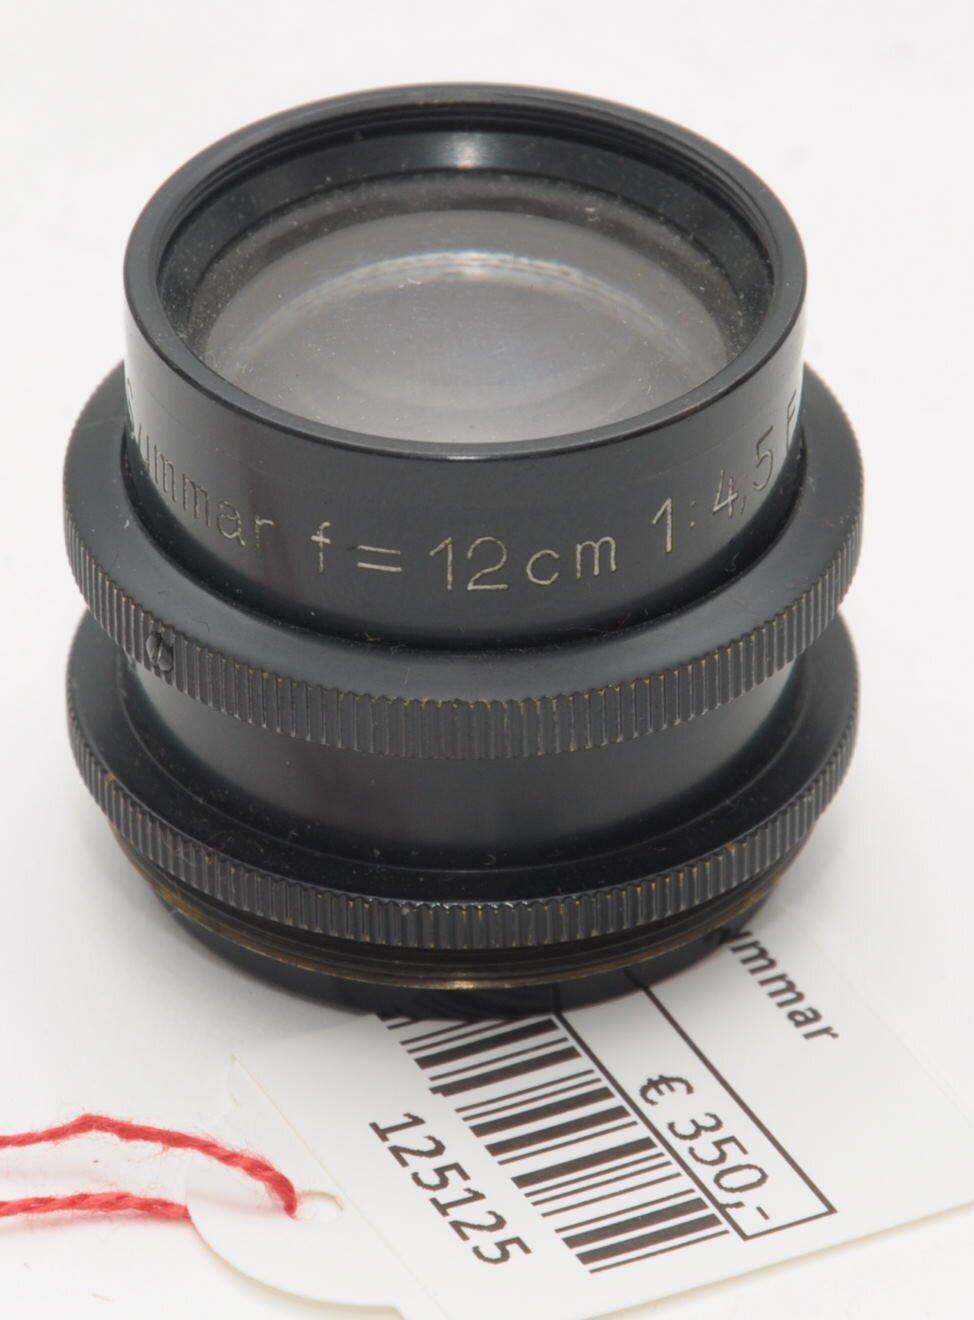 Leitz 4,5/12 cm Summar